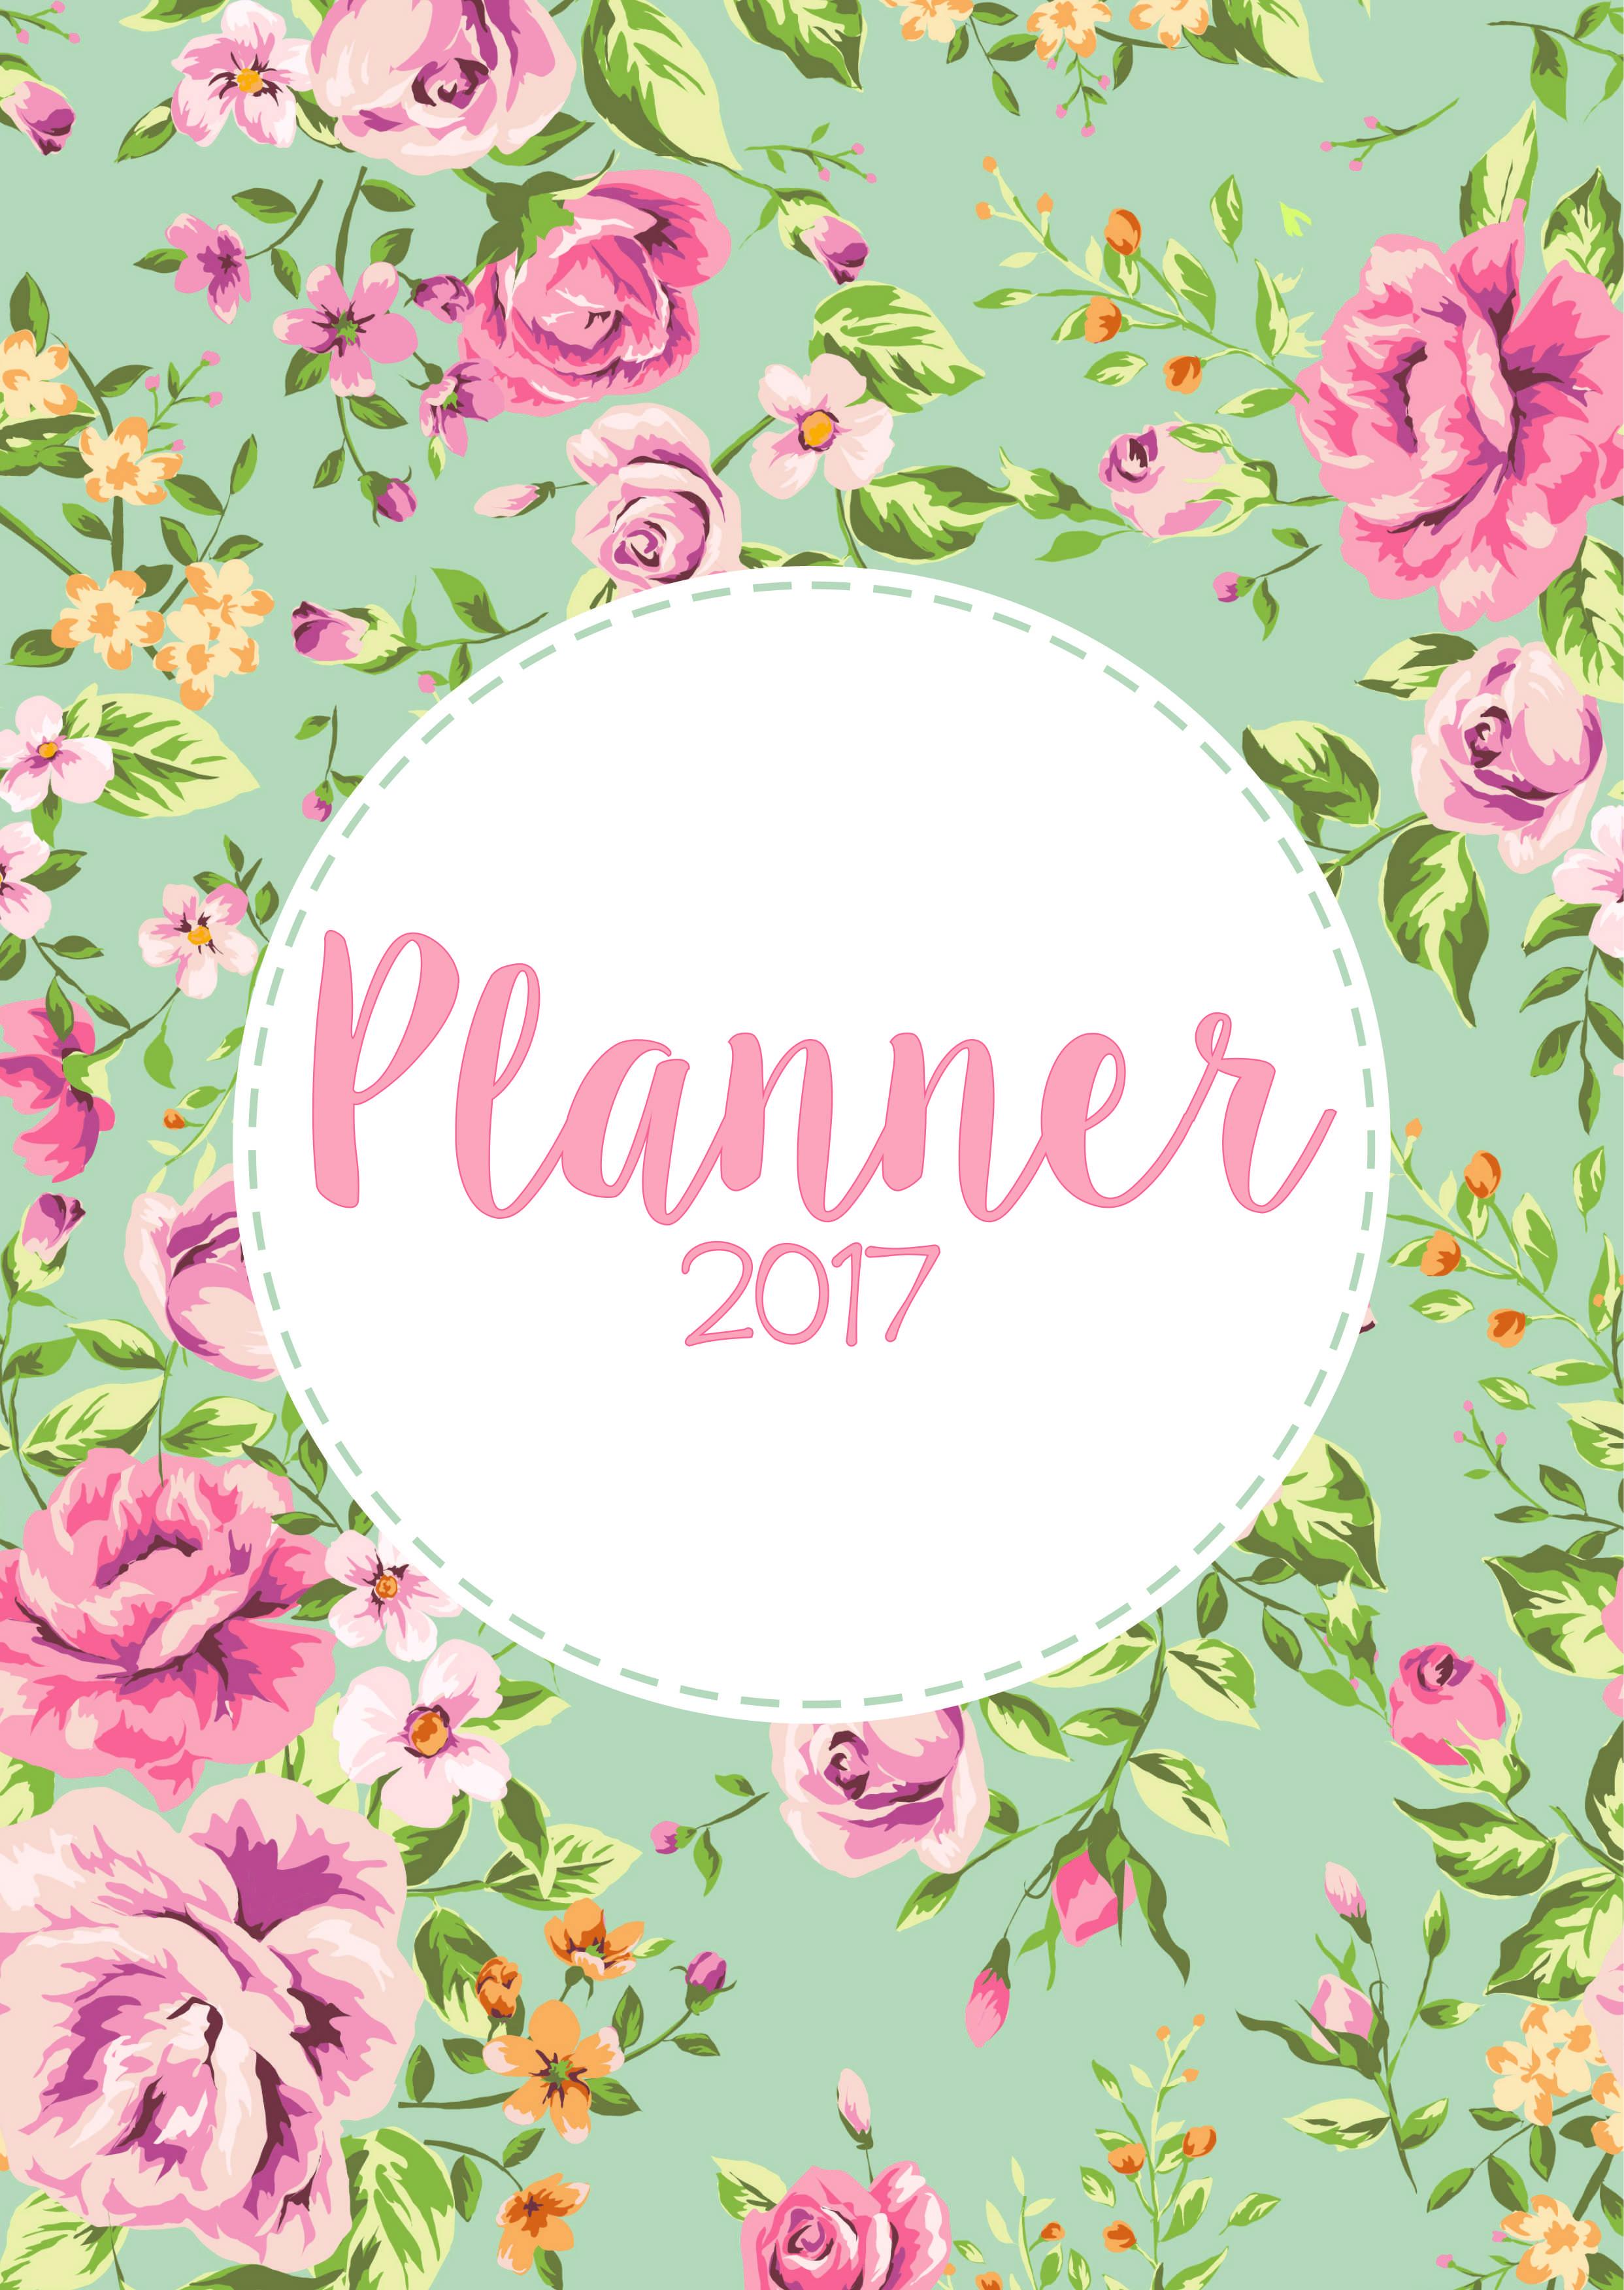 planner-2017-floral-arquivo-digital-planner